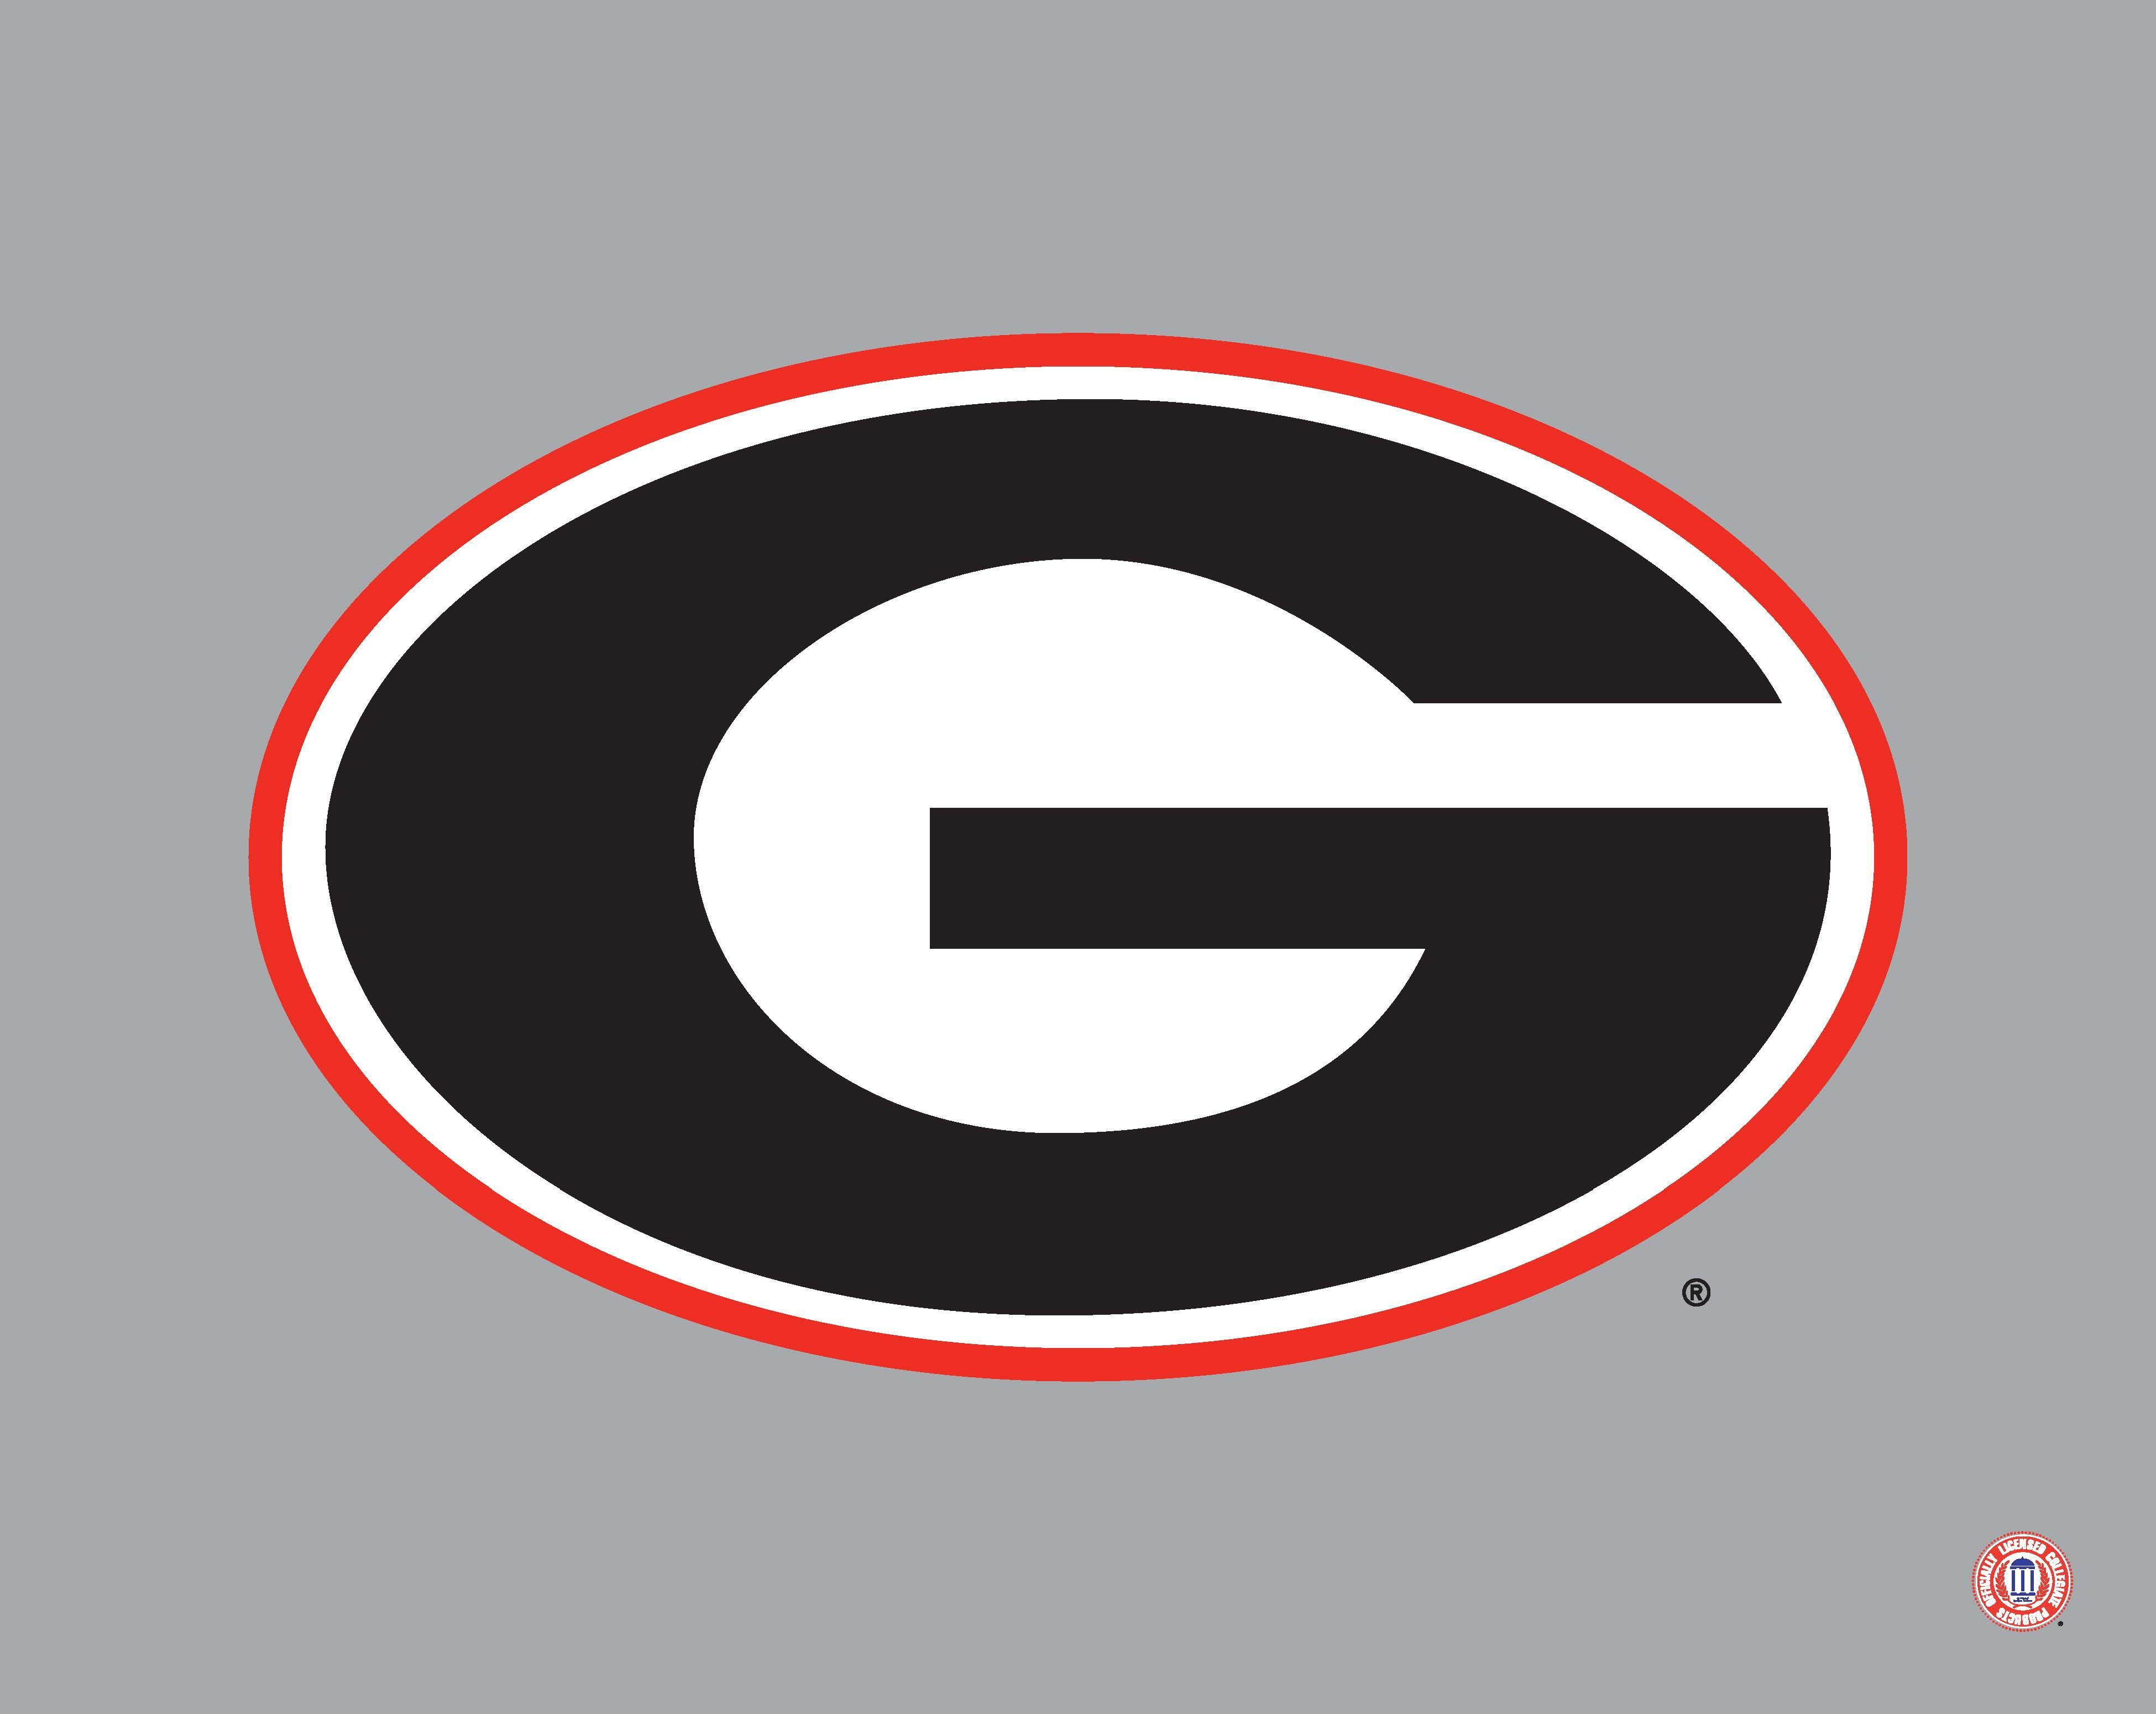 georgia bulldogs logo [ 3900 x 3100 Pixel ]